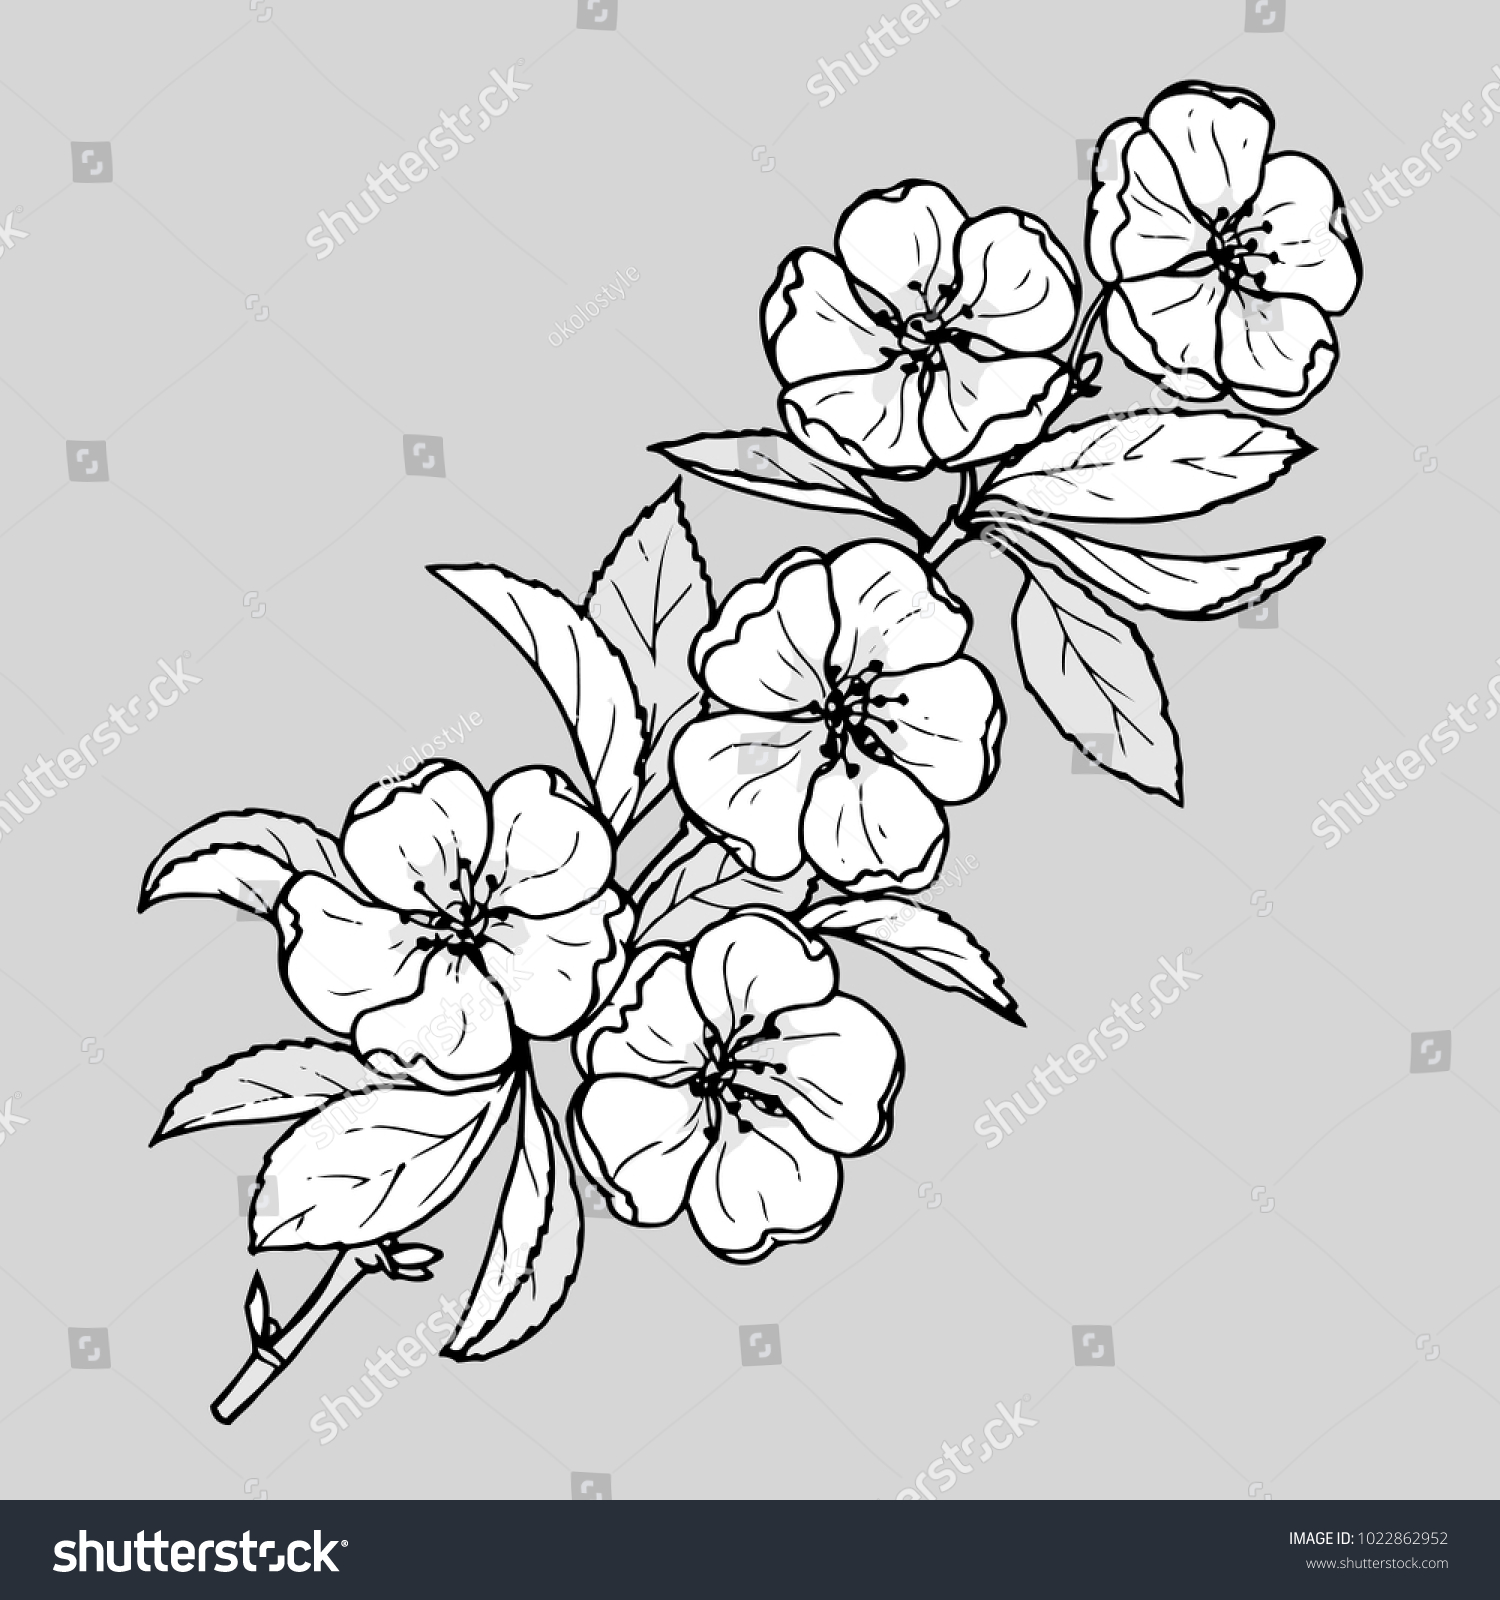 Ink Pencil Black White Flower Sketch Transparent Stock Vector